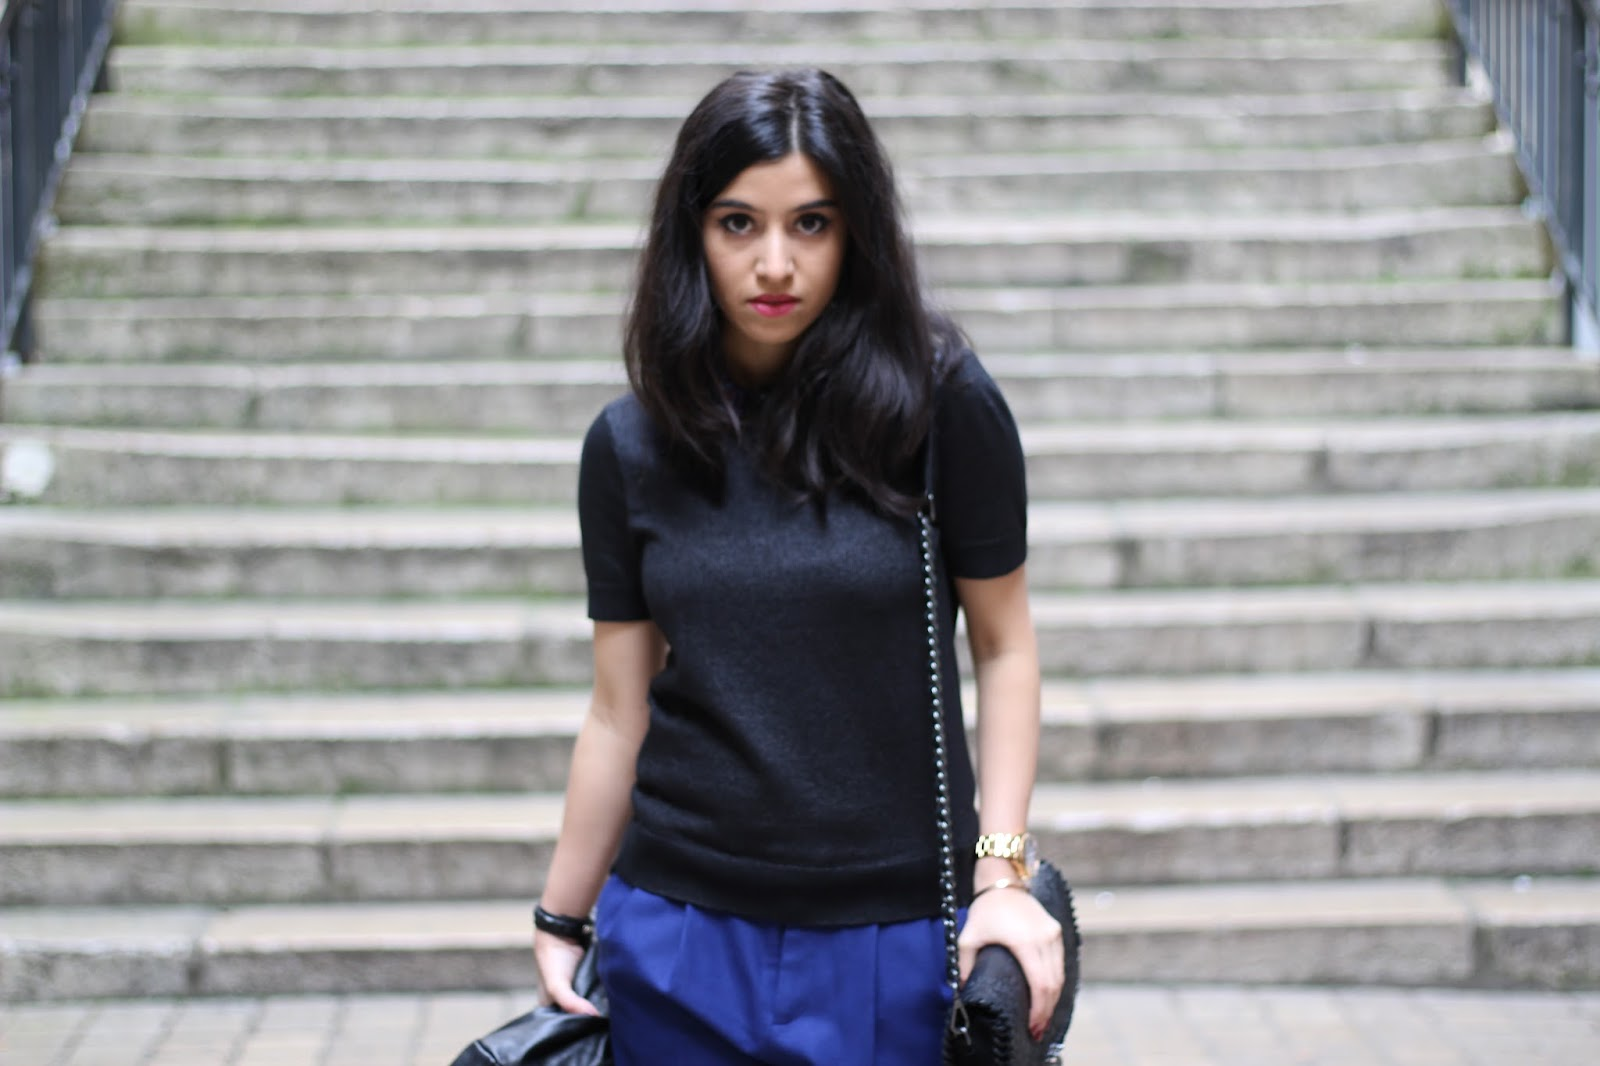 blog mode lyon, blogueuse à lyon, blogueuse mode, col claudine